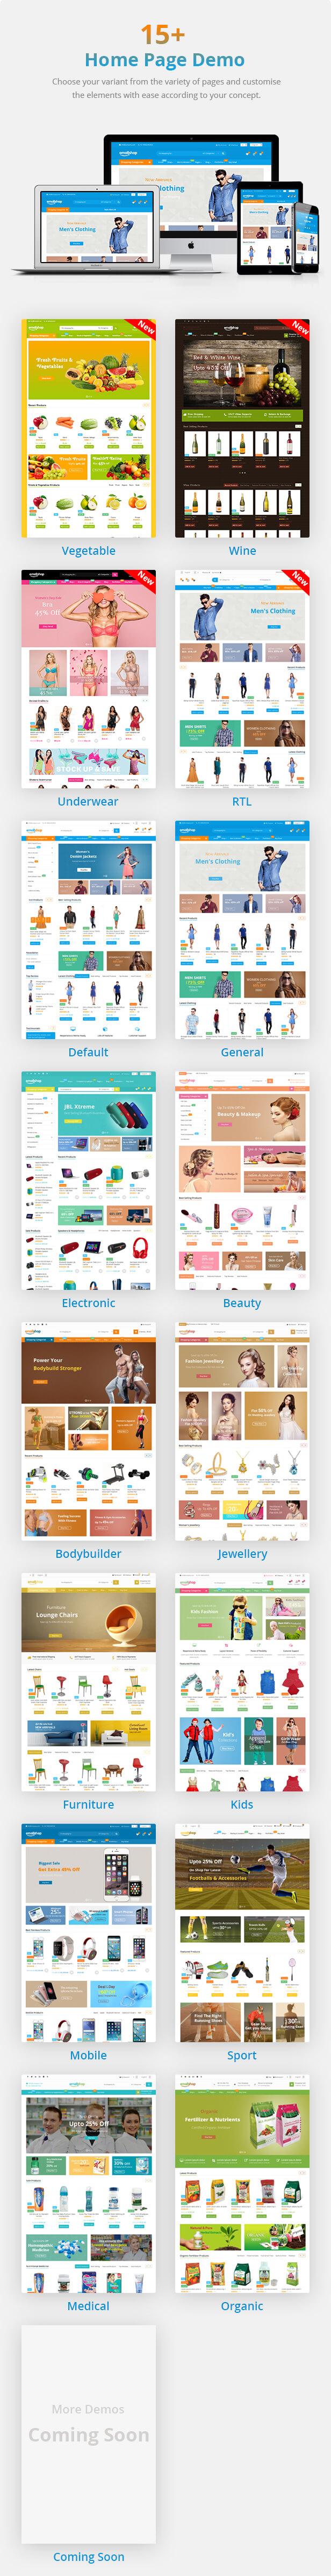 marketing img - EmallShop - Responsive WooCommerce WordPress Theme